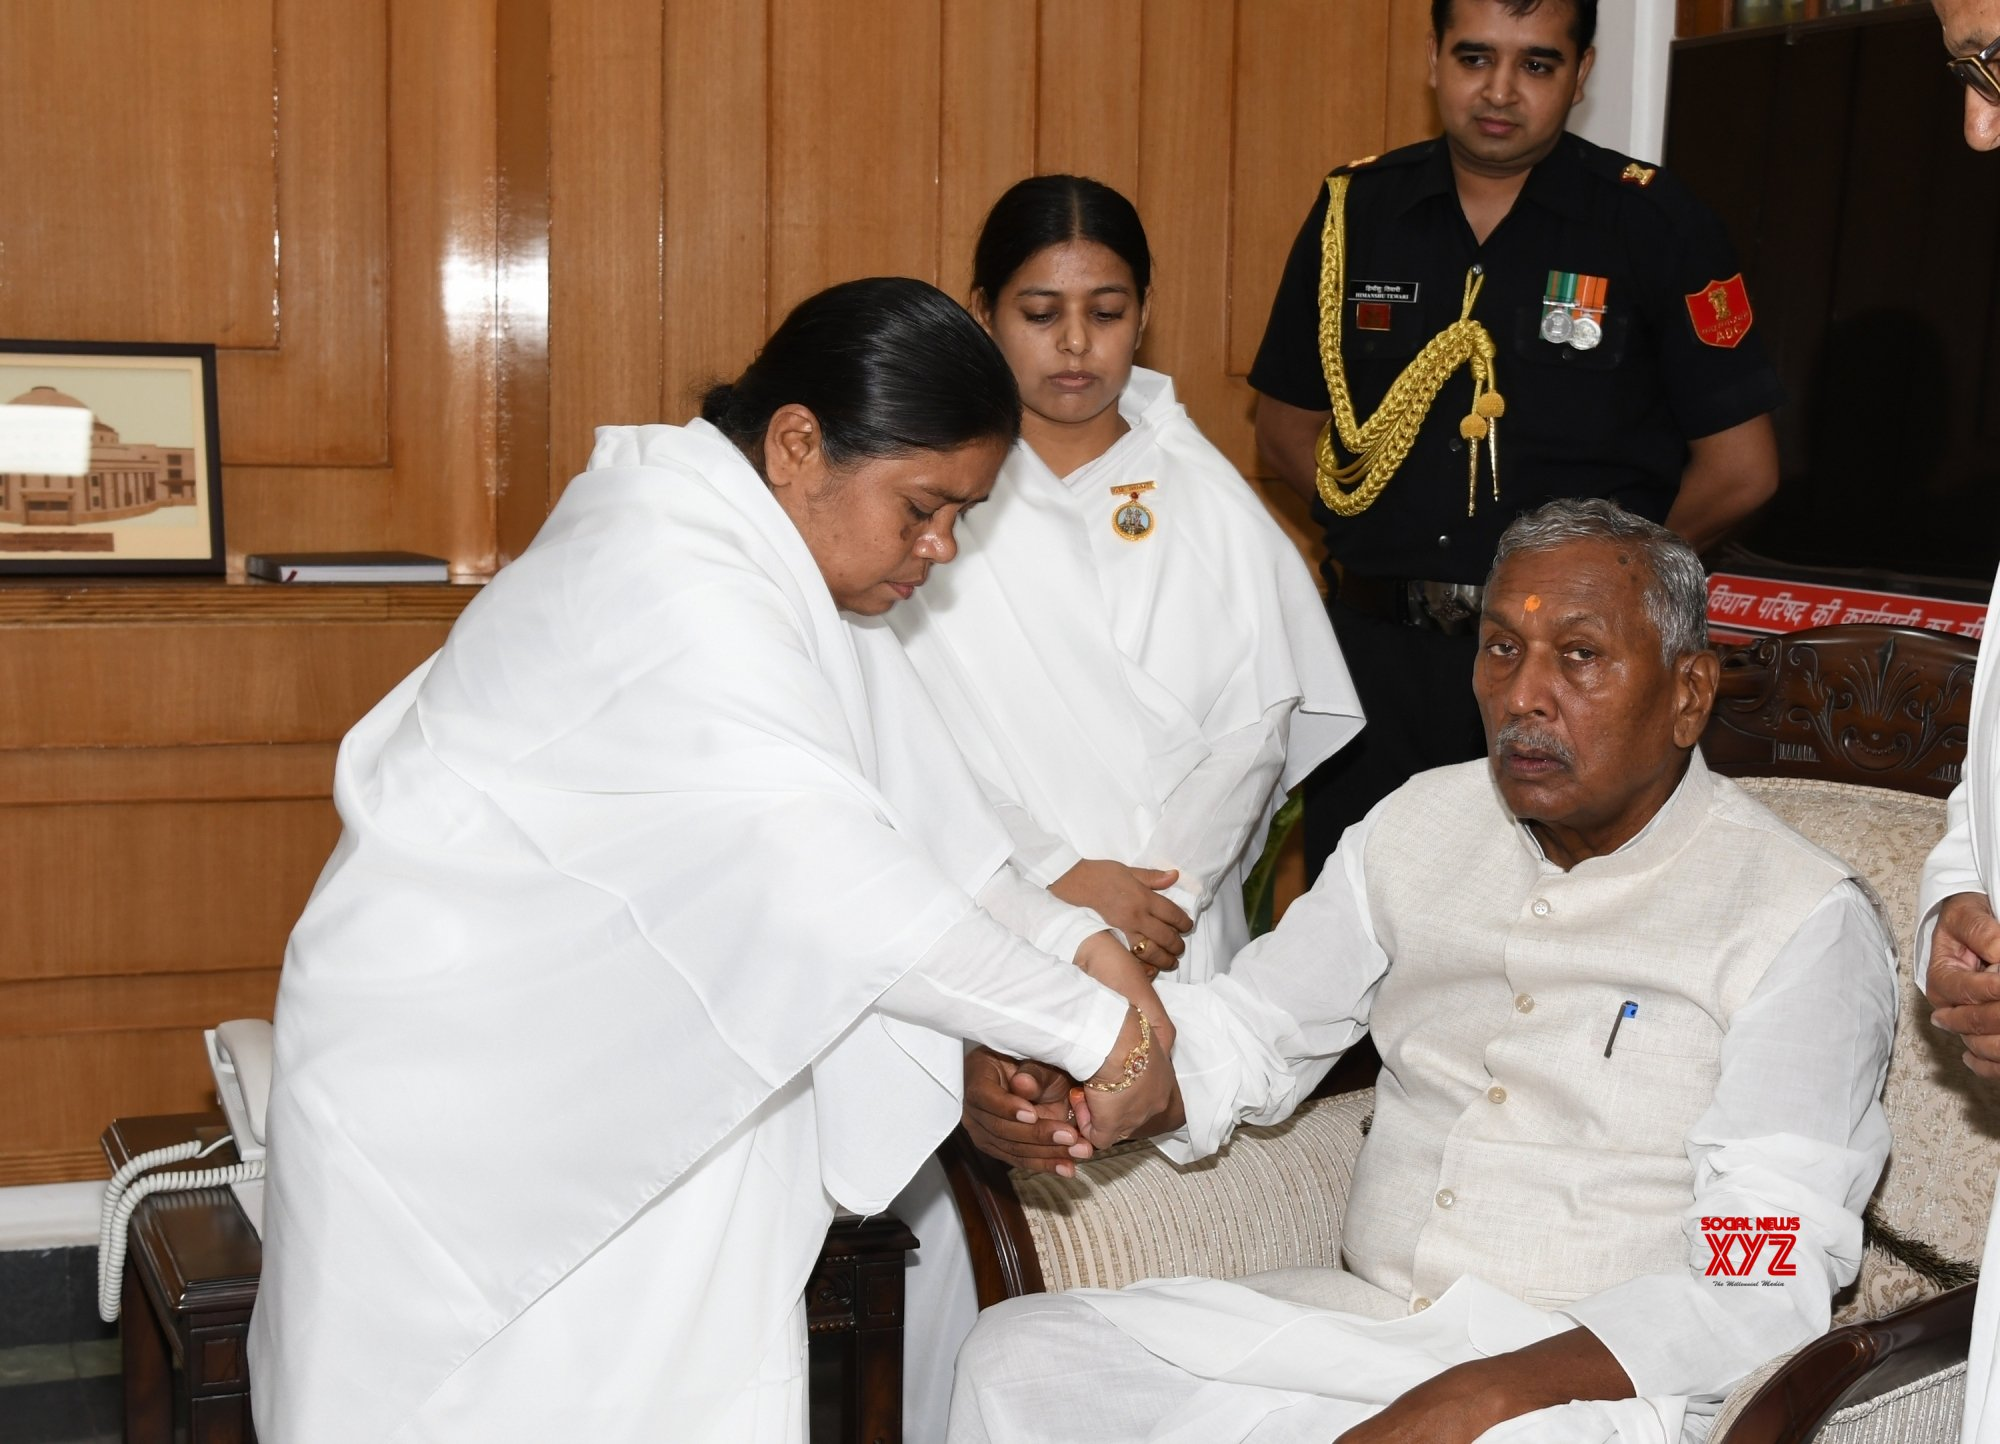 Patna: Bihar Governor during Raksha Bandhan celebrations #Gallery